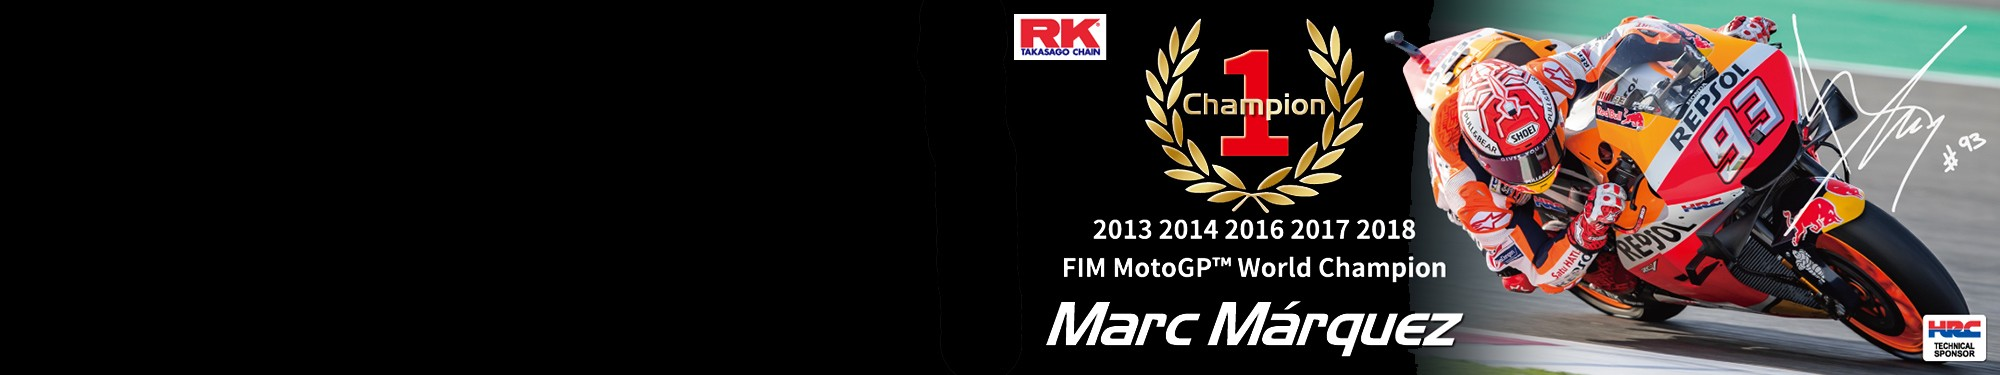 RK Chain - MotoGP World Champion